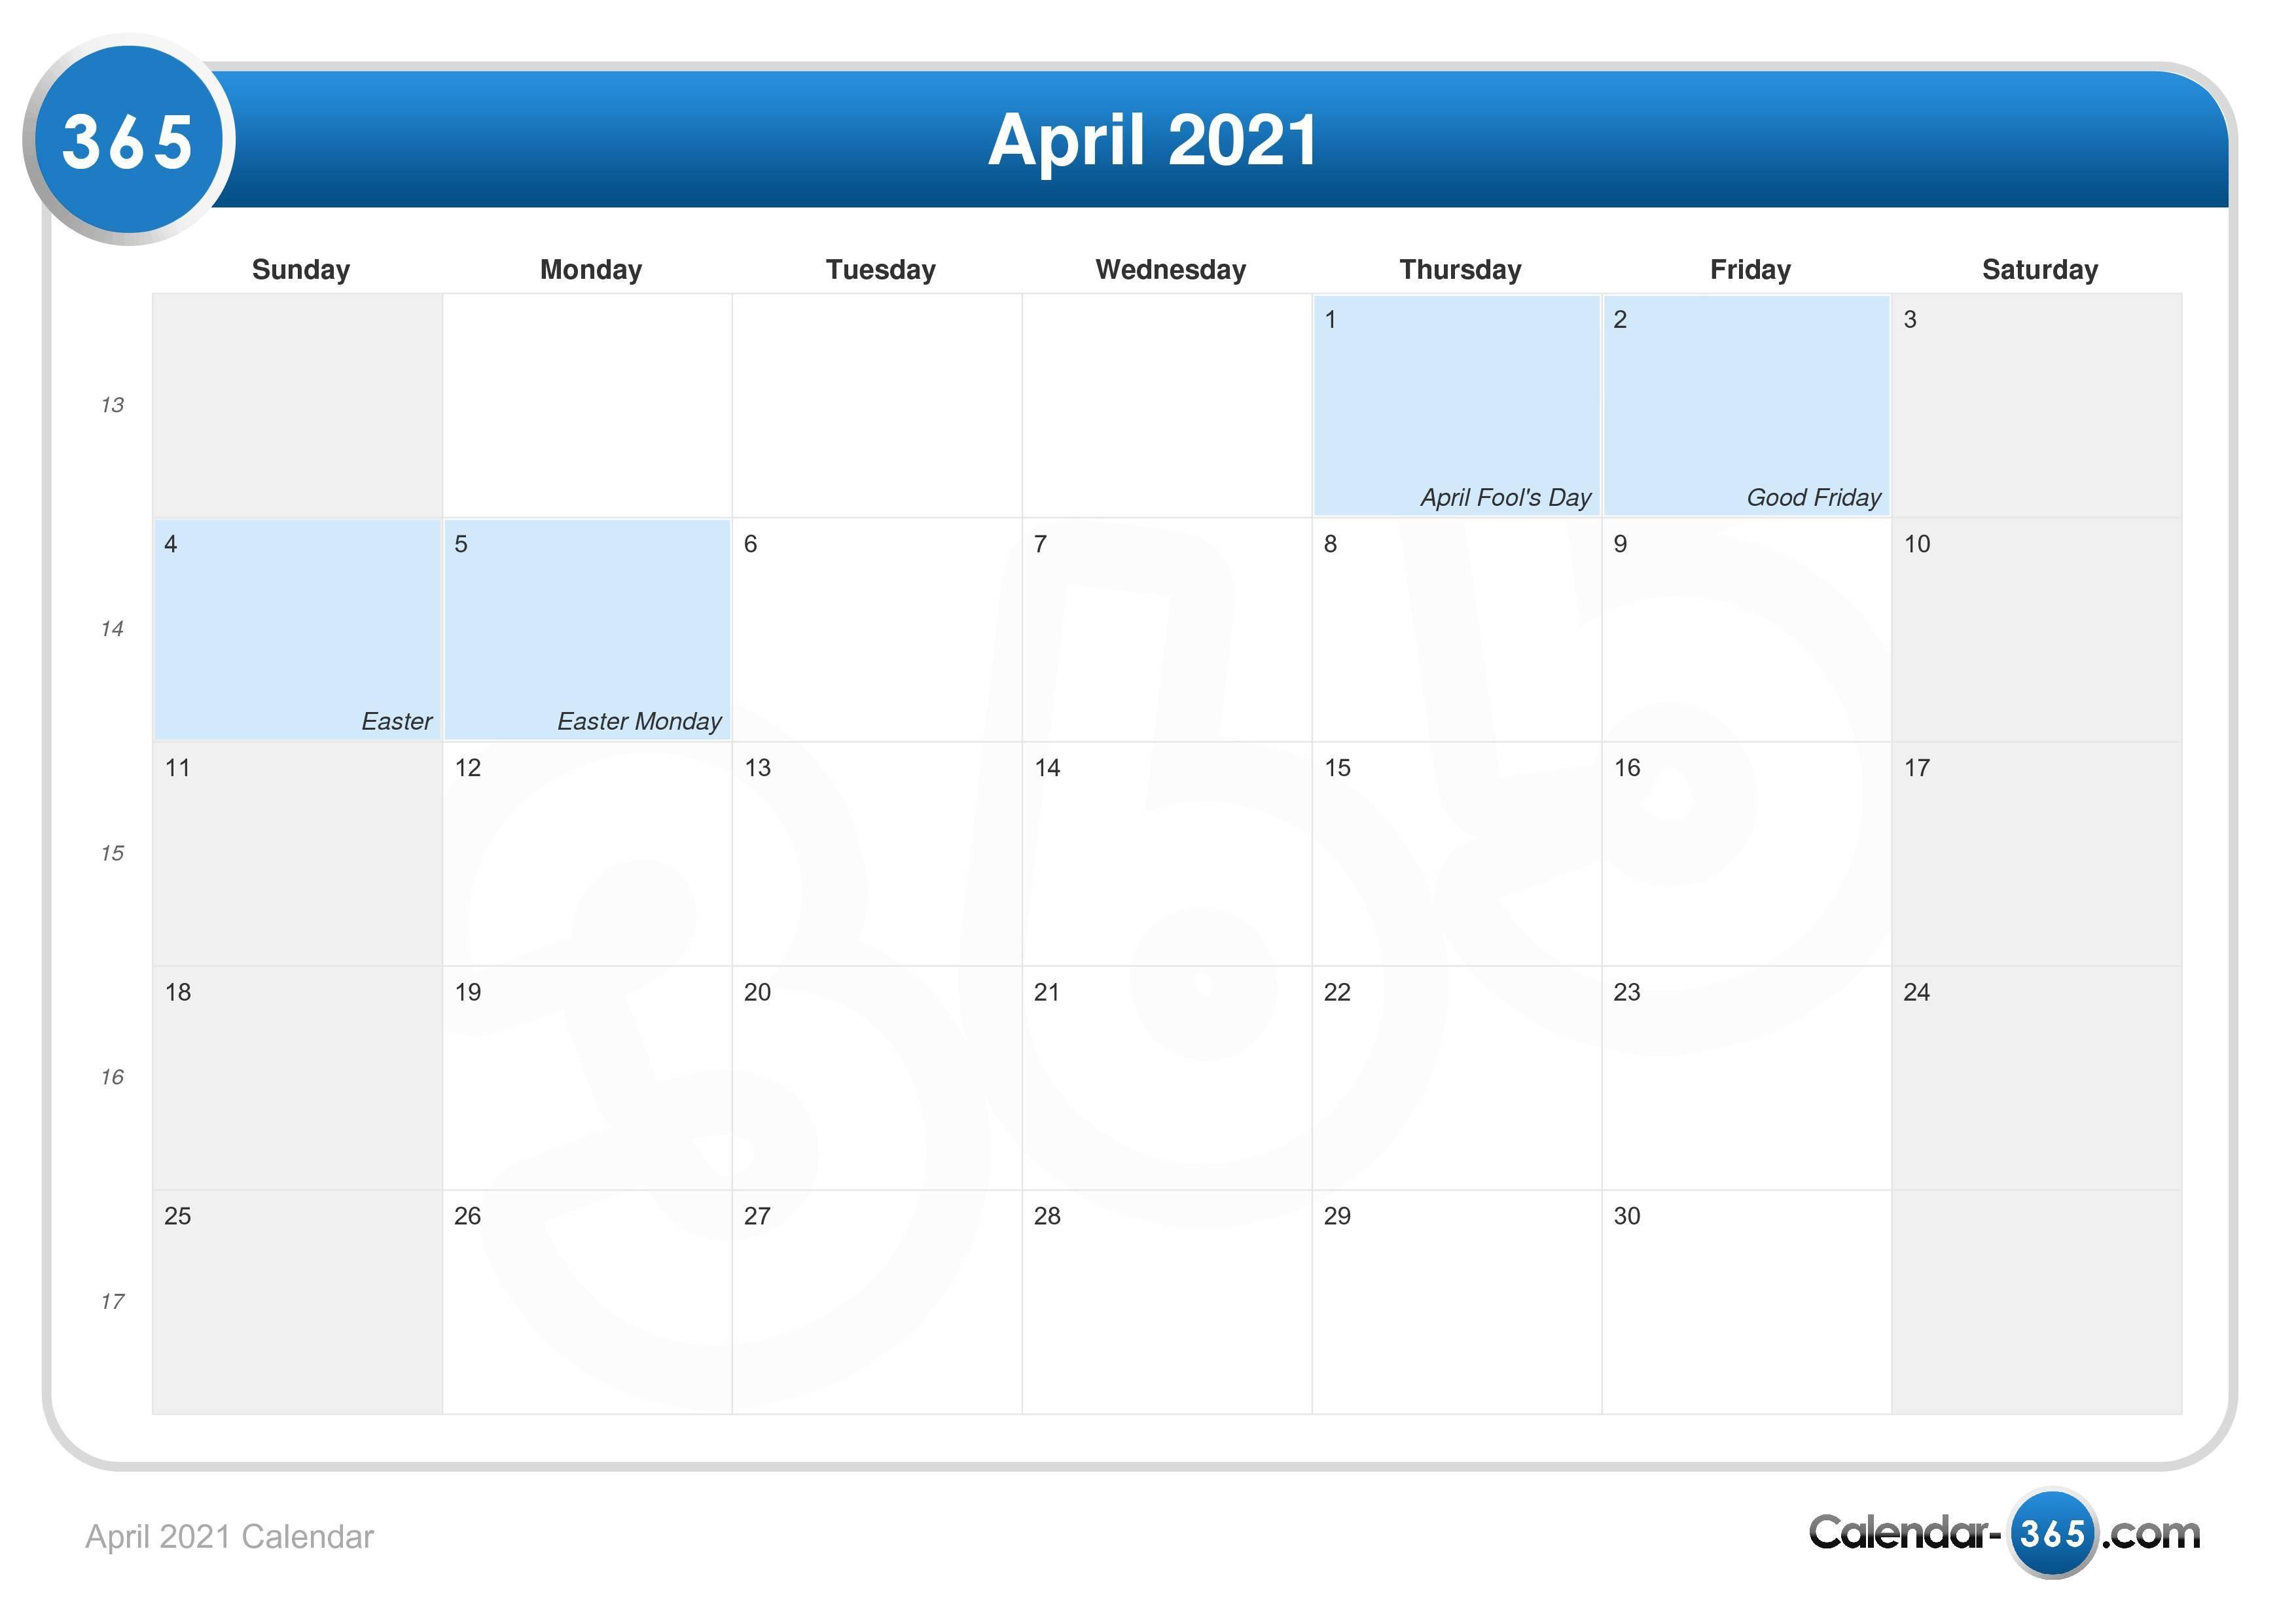 Calendar Easter 2021 April 2021 Calendar